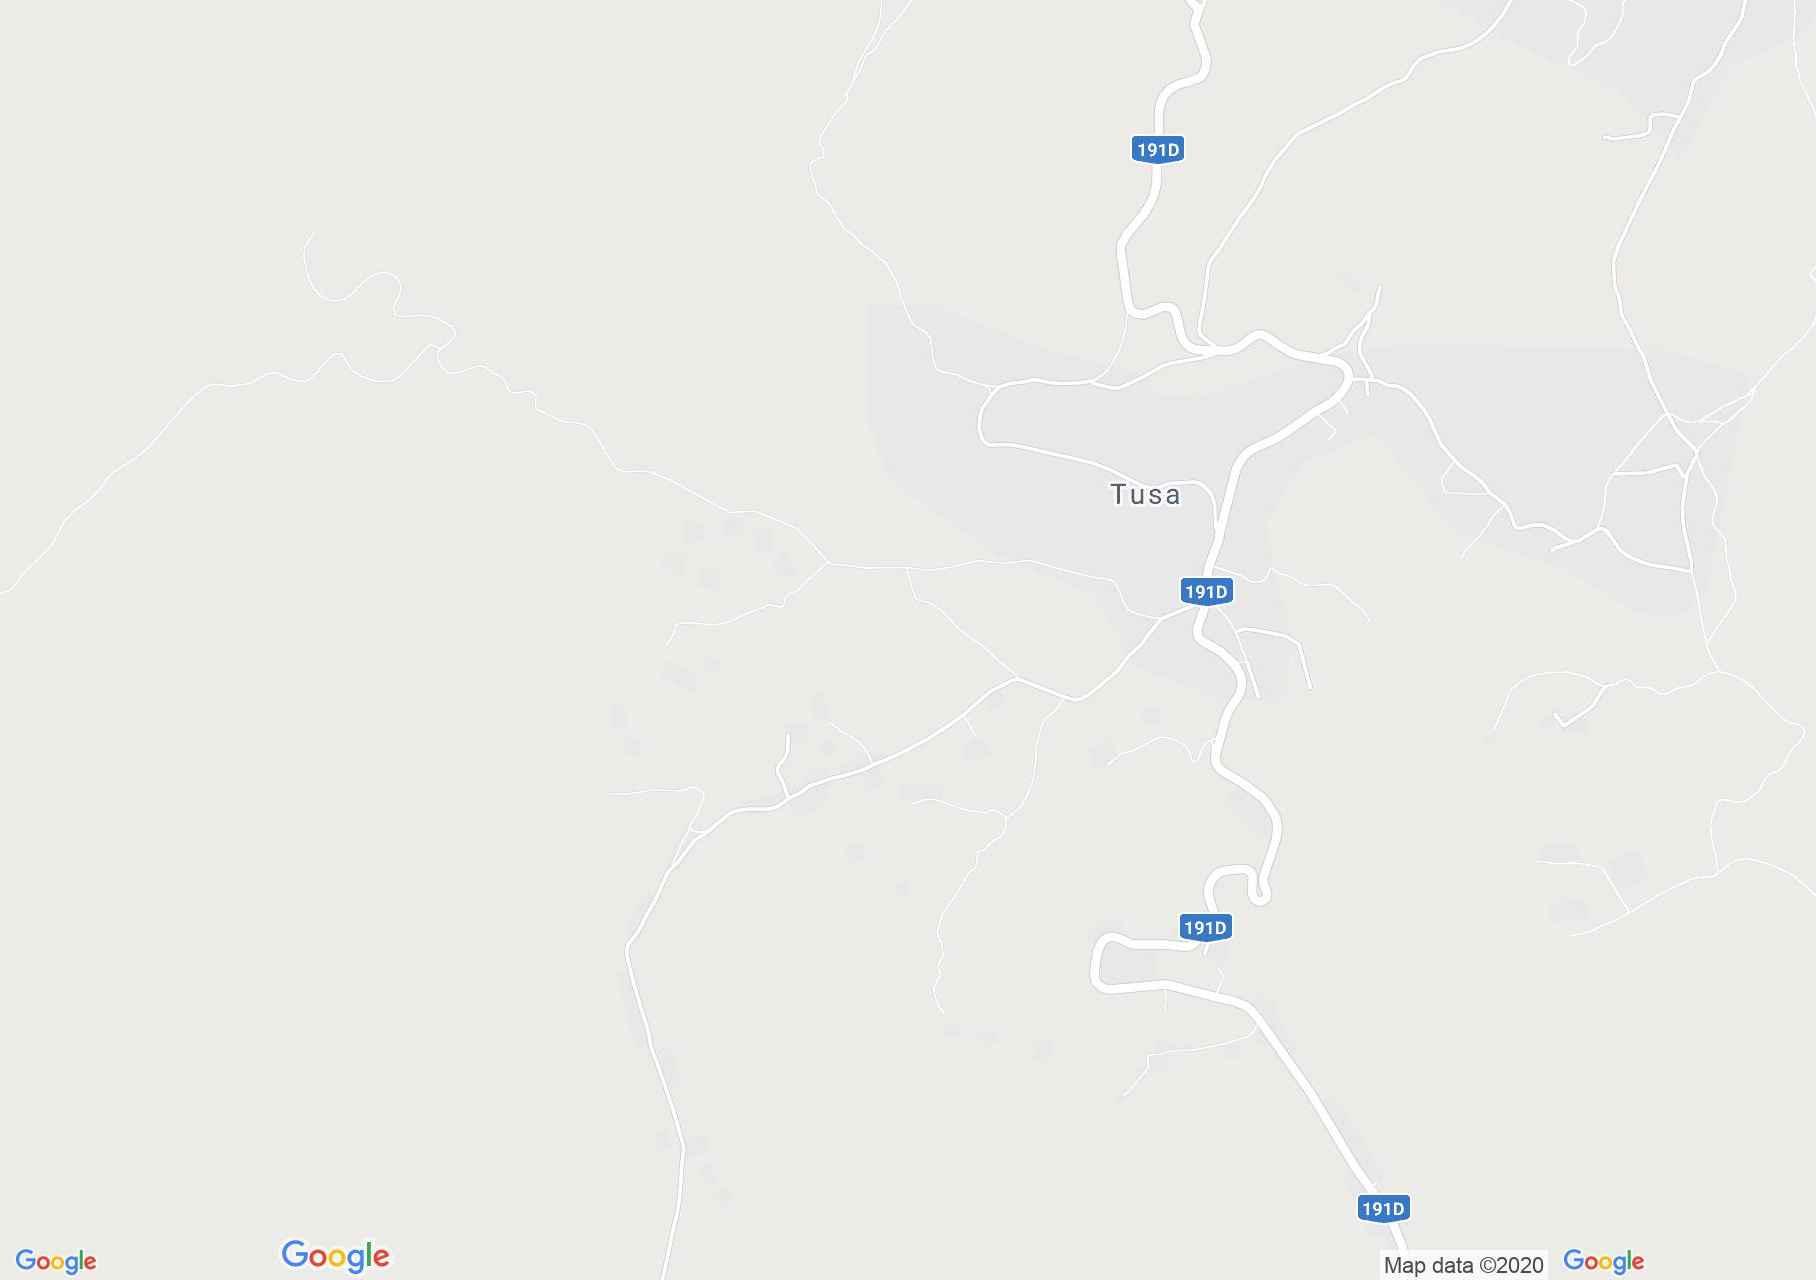 Tusa, Harta turistică interactivă